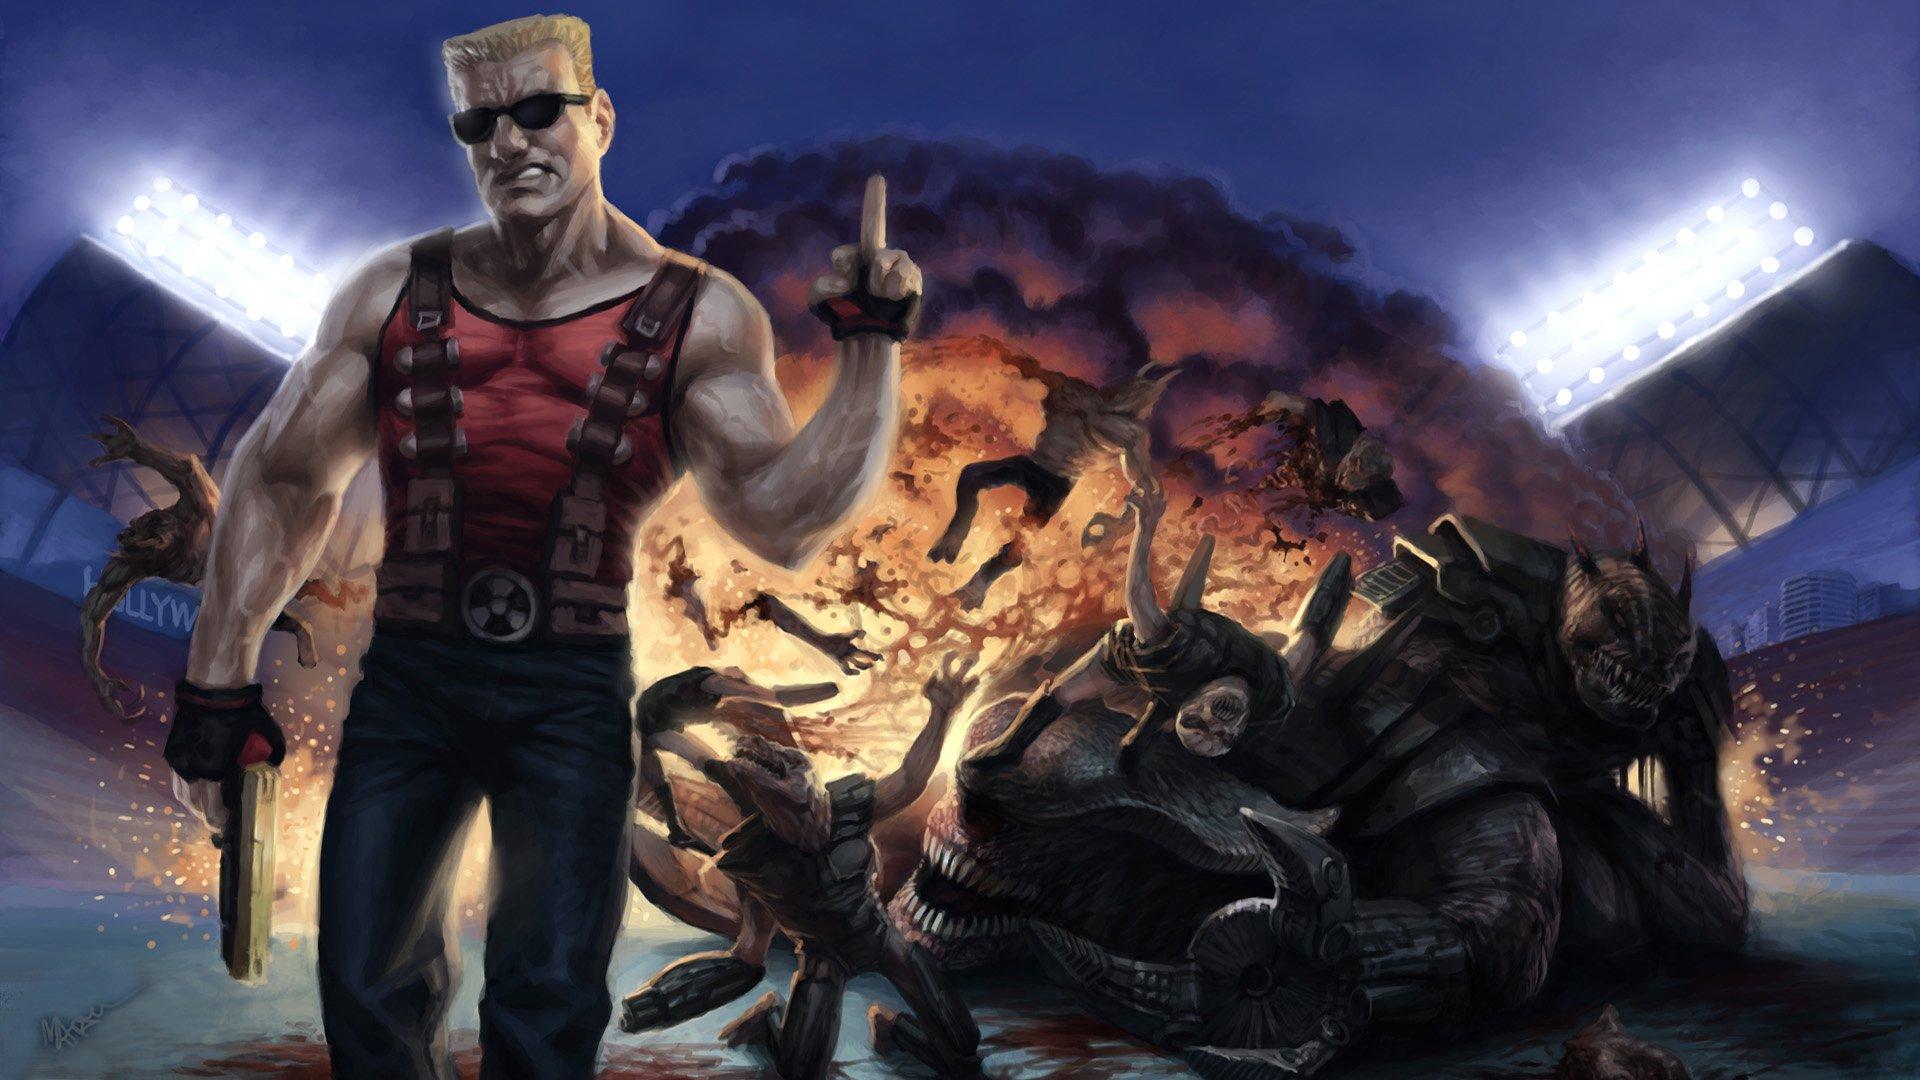 Creature Duke Nukem Game HD Wallpaper